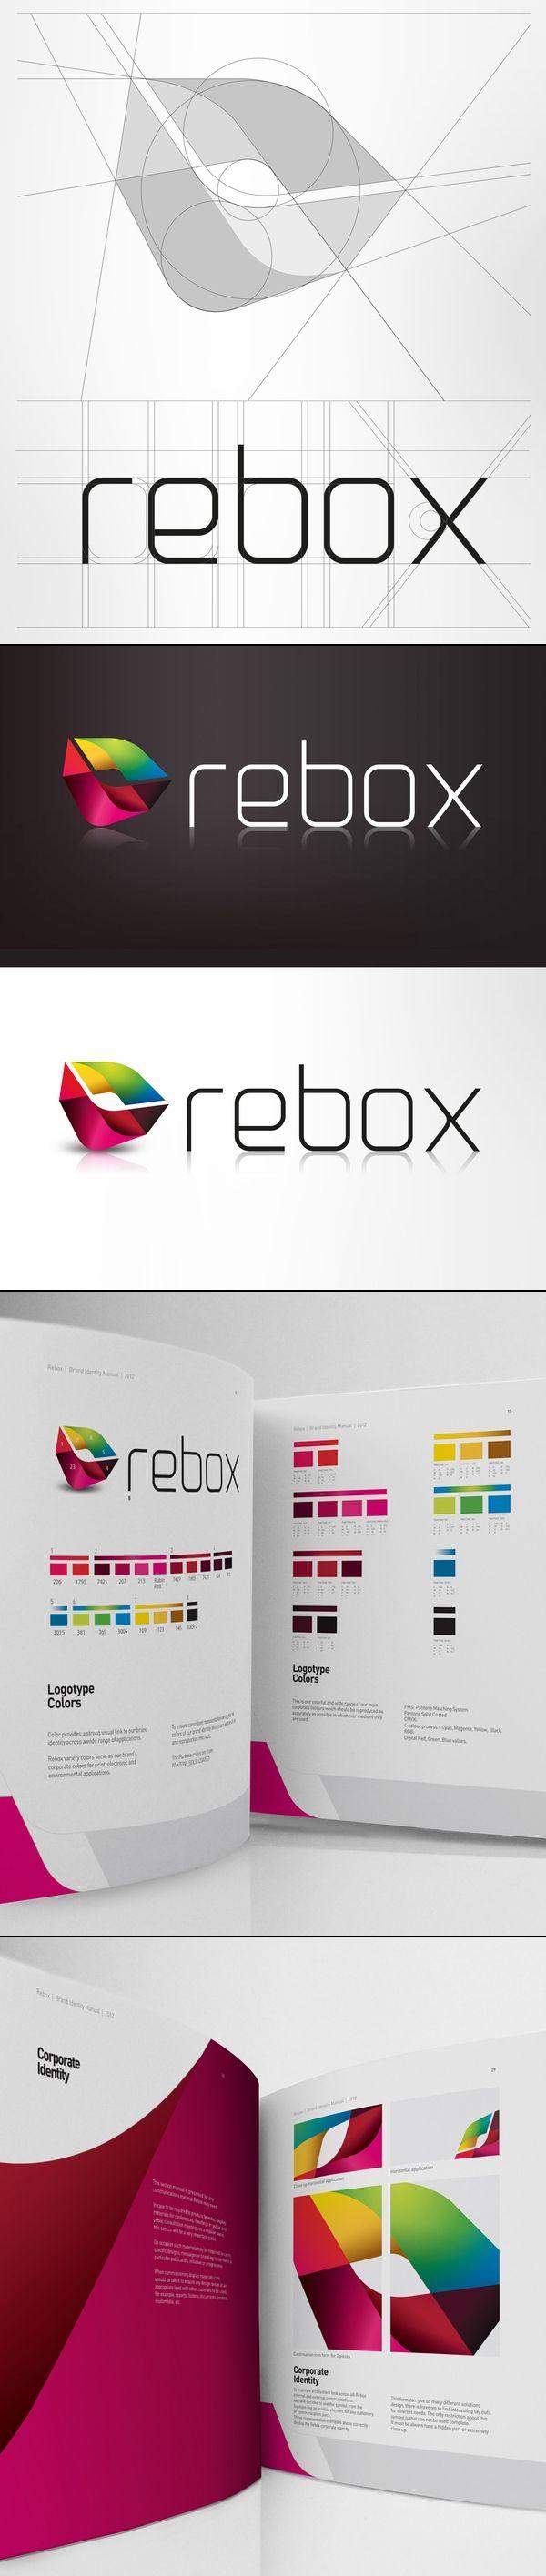 Rebox Logo Design.